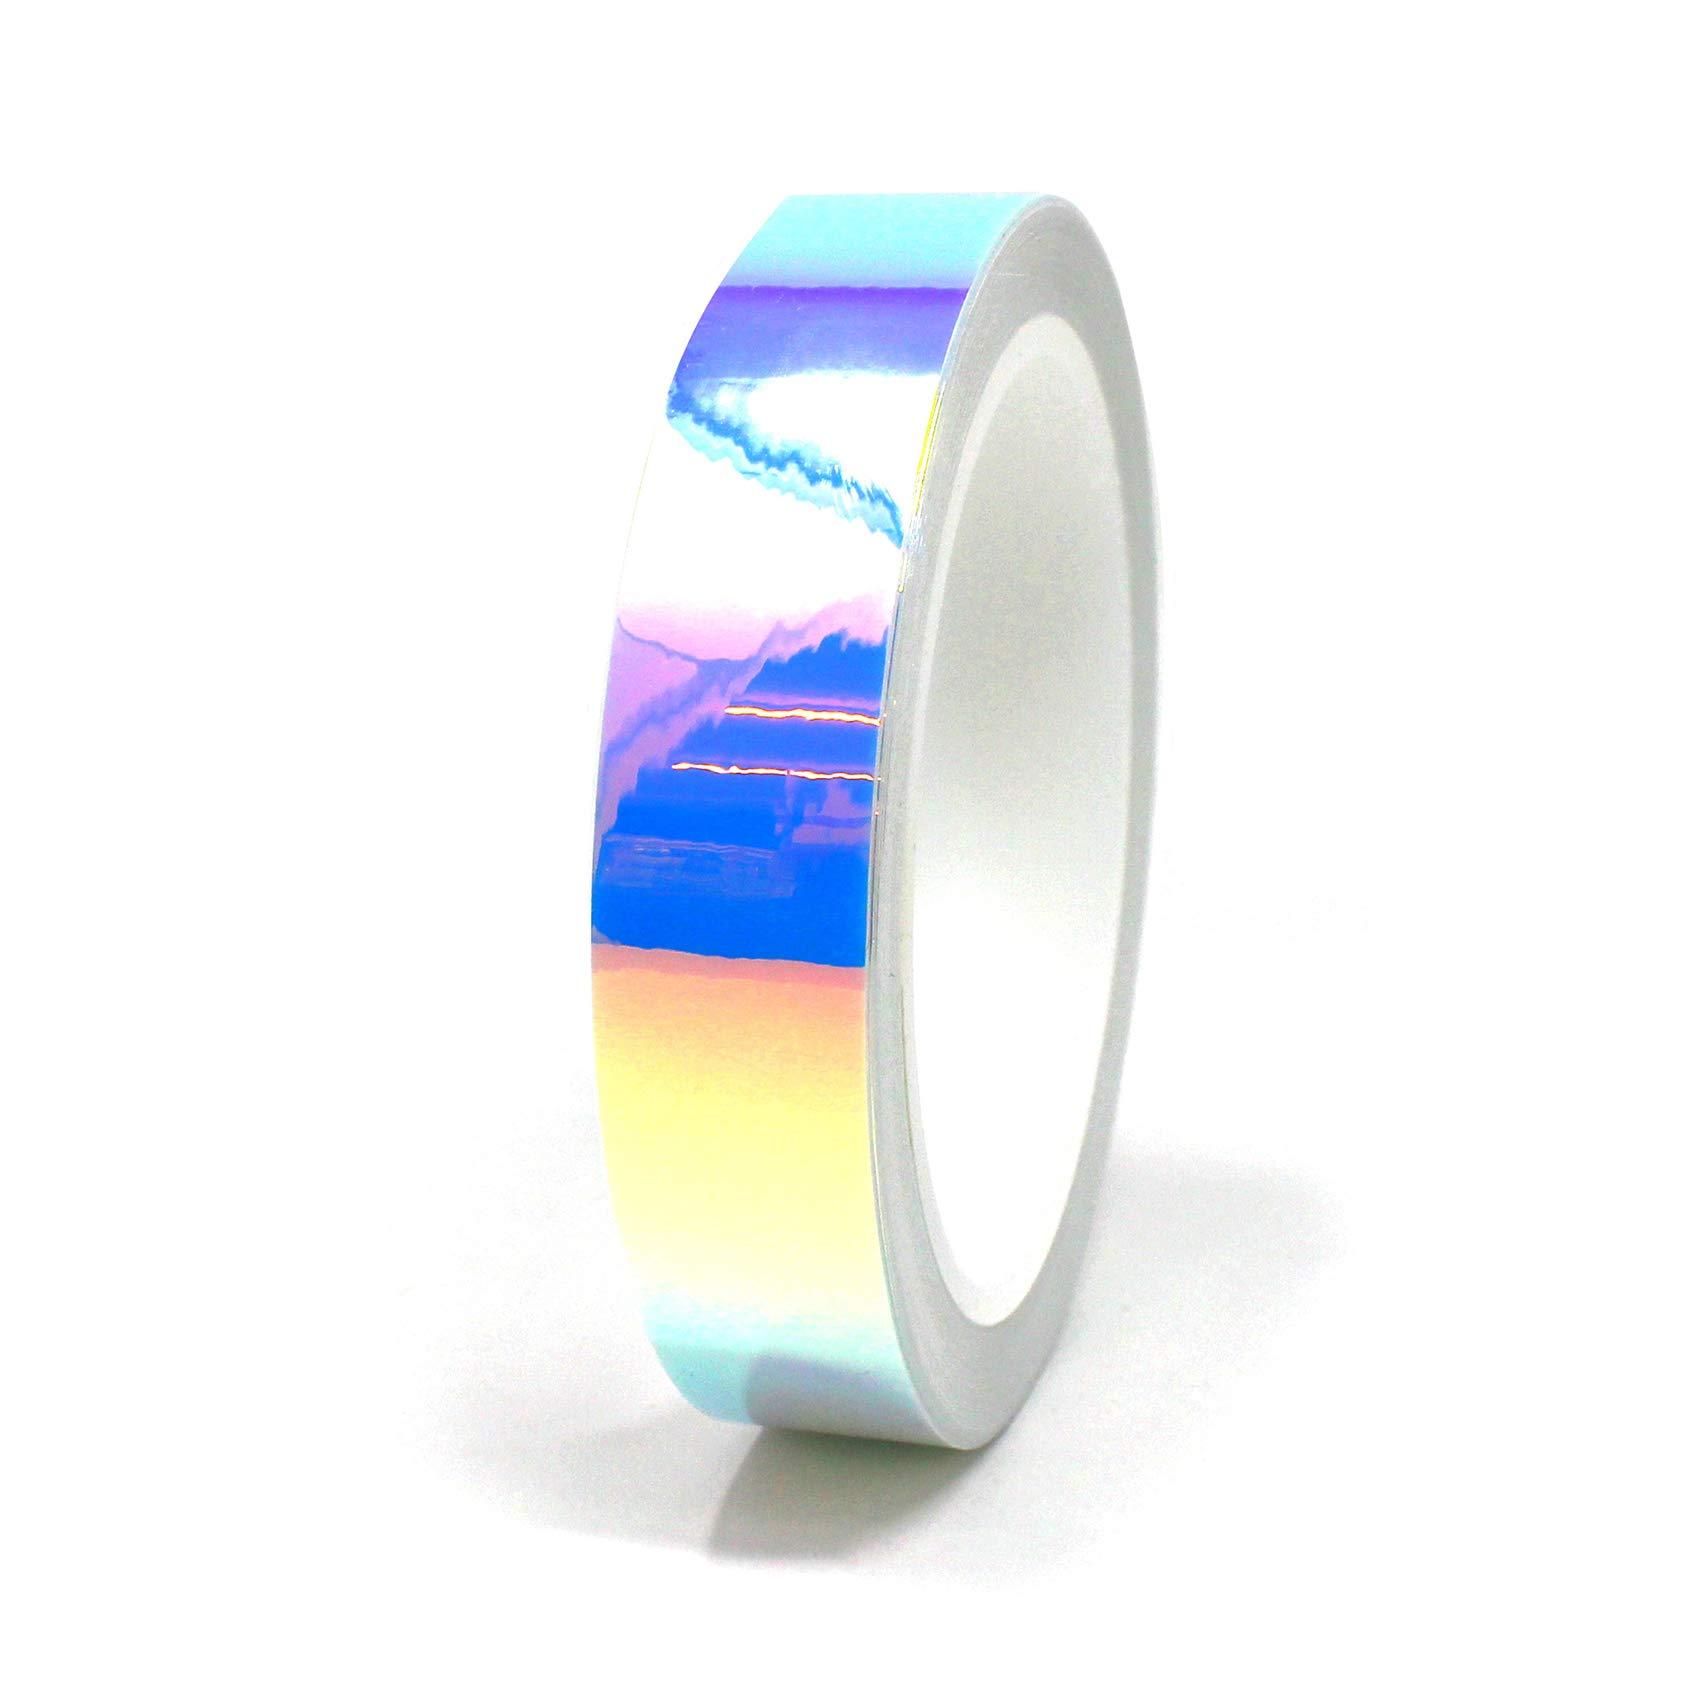 300 x 152cm Finest Folia 19,73/€//m/² Laser Hologram Chrom Schwarz Auto Folie mit Luftkan/äle Holographic